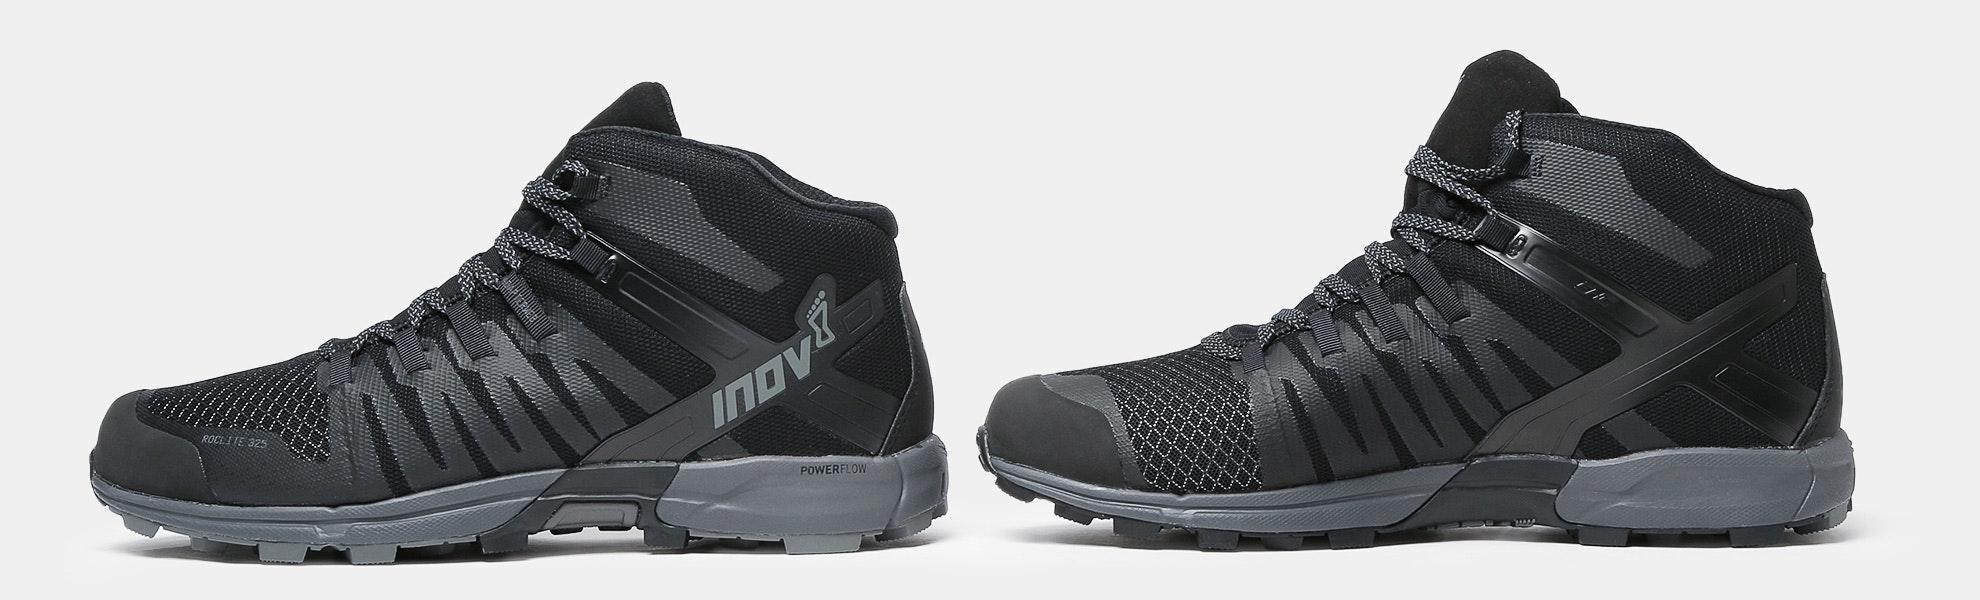 Inov-8 Roclite 325 Boots